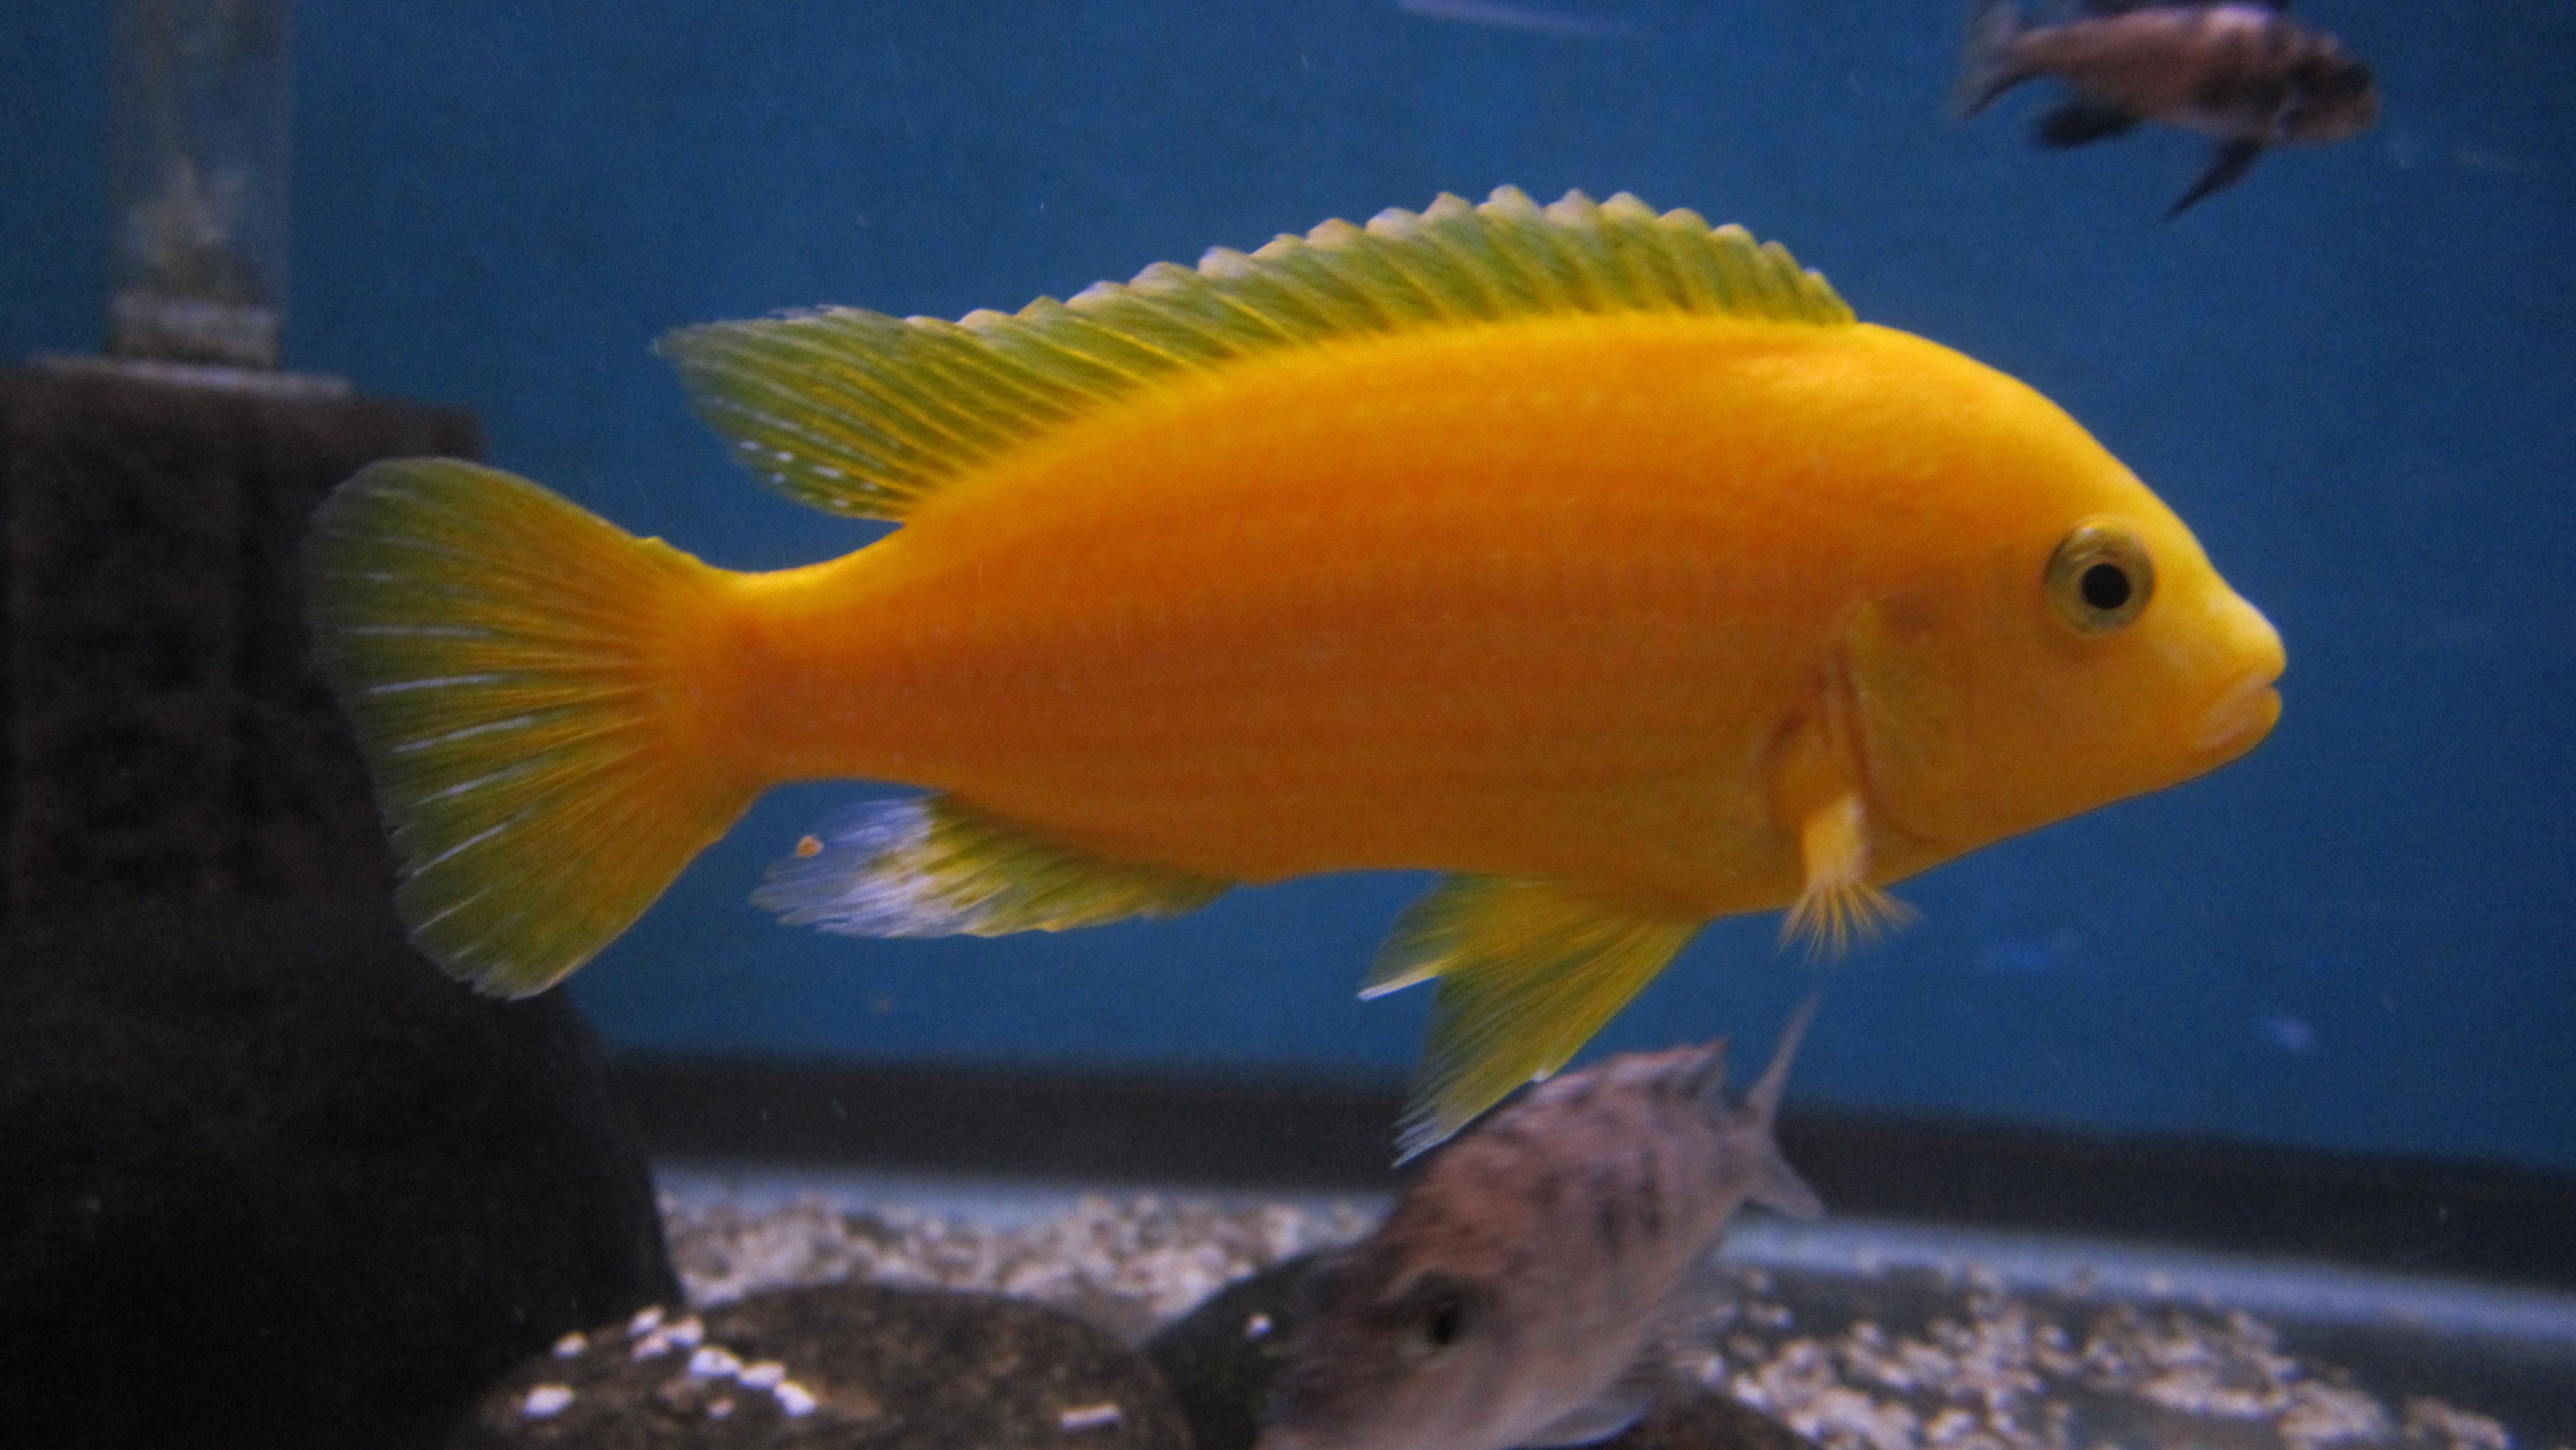 cichlids.com: Labidochromis caeruleus Yellow Lab...